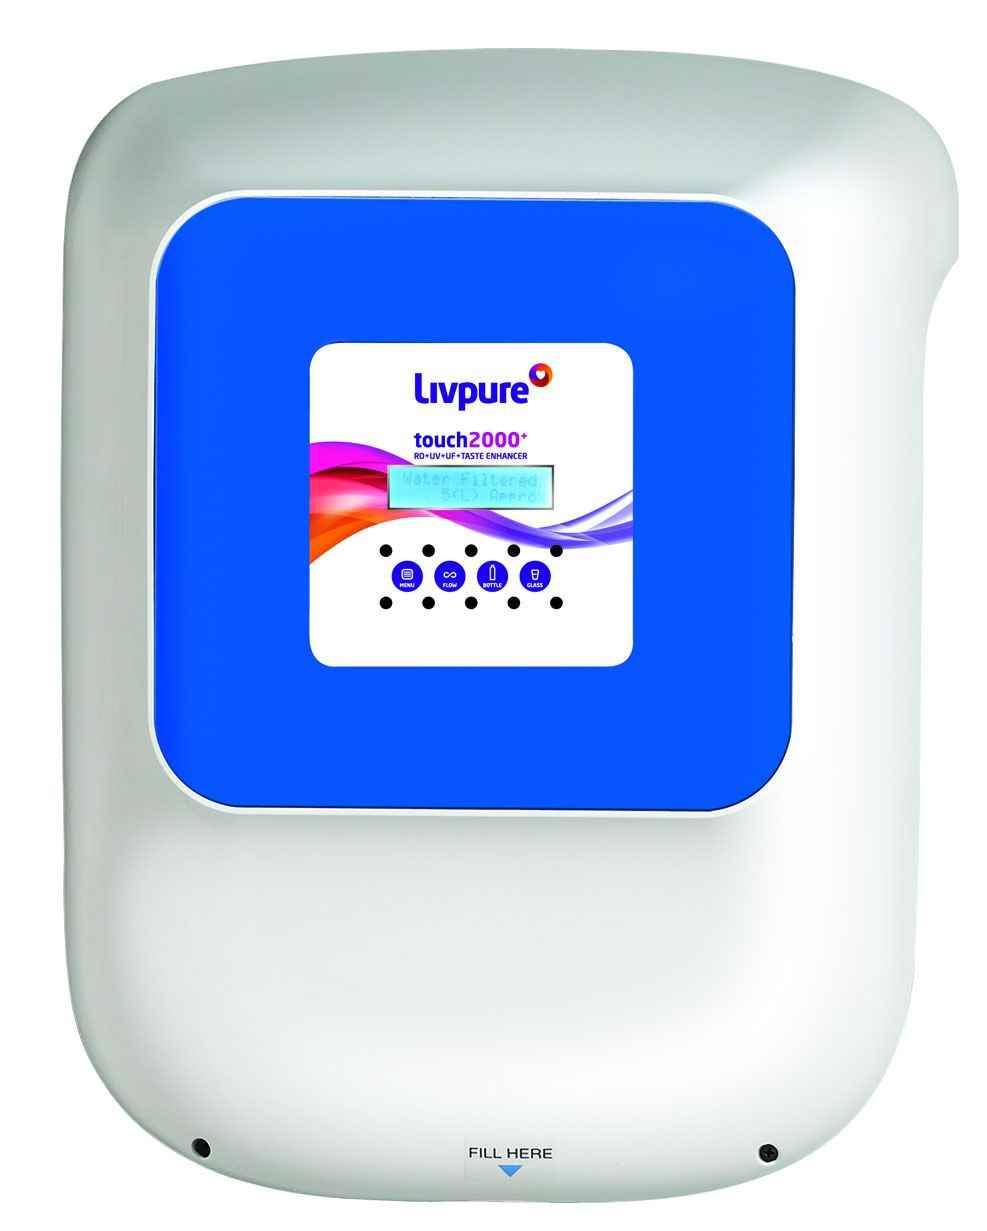 Touch2000plusPlusFrontView-8b5d1